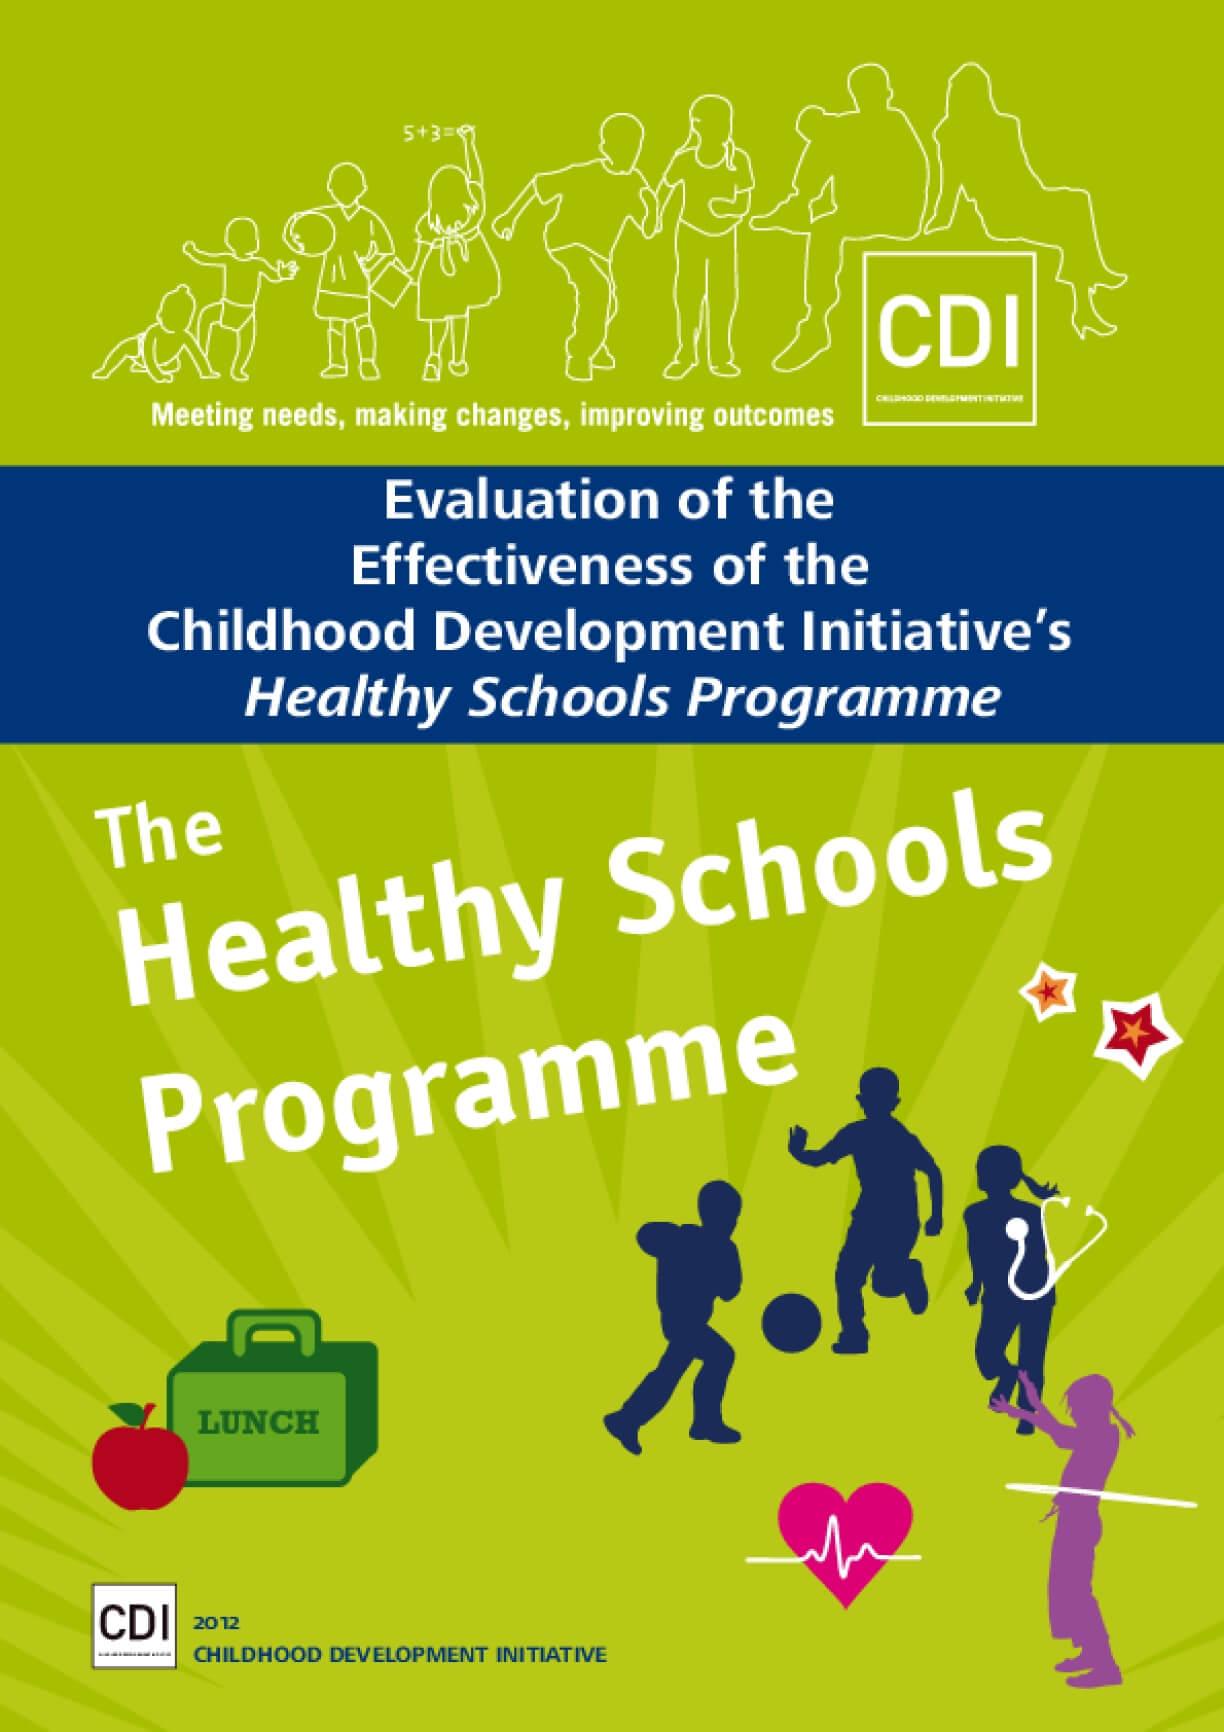 Evaluation of Effectiveness of the Childhood Development Initiative's Healthy Schools Programme